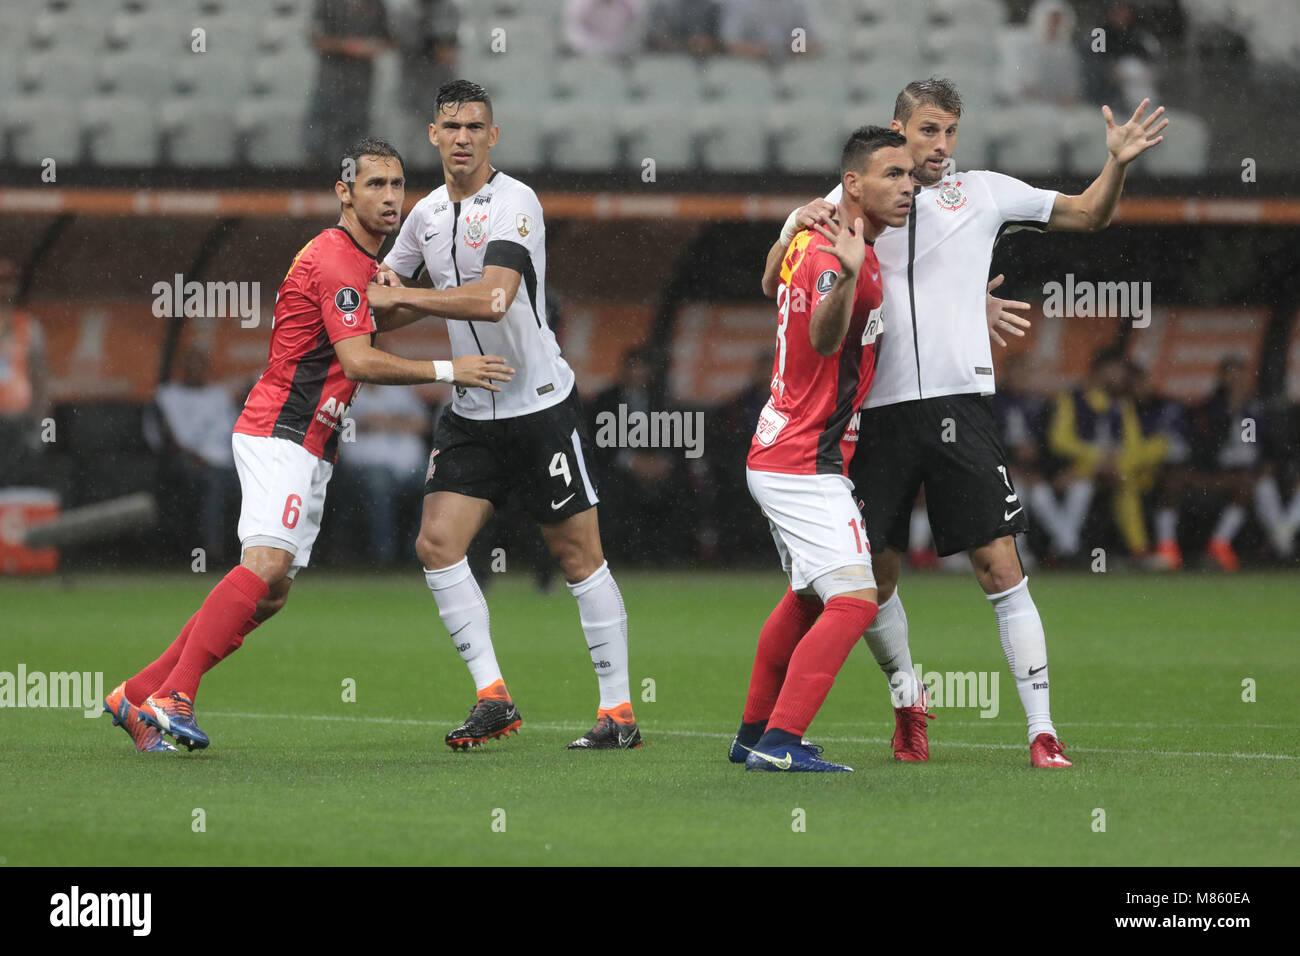 Sao Paulo Sp  Corinthians X Deportivo Lara Henrique And